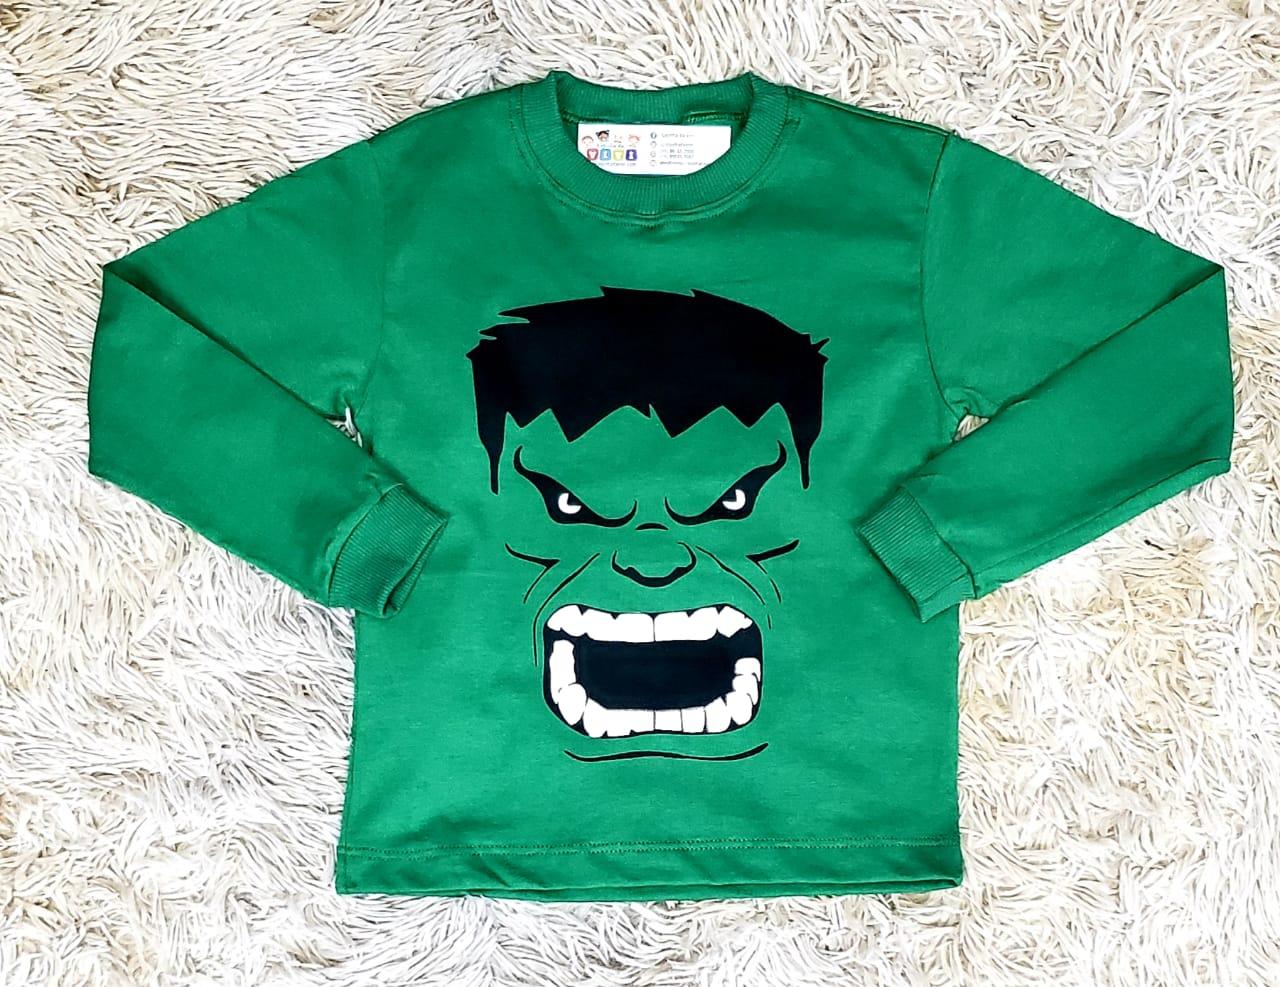 Calça Jeans com Camiseta Hulk e Camisa Xadrez Infantil